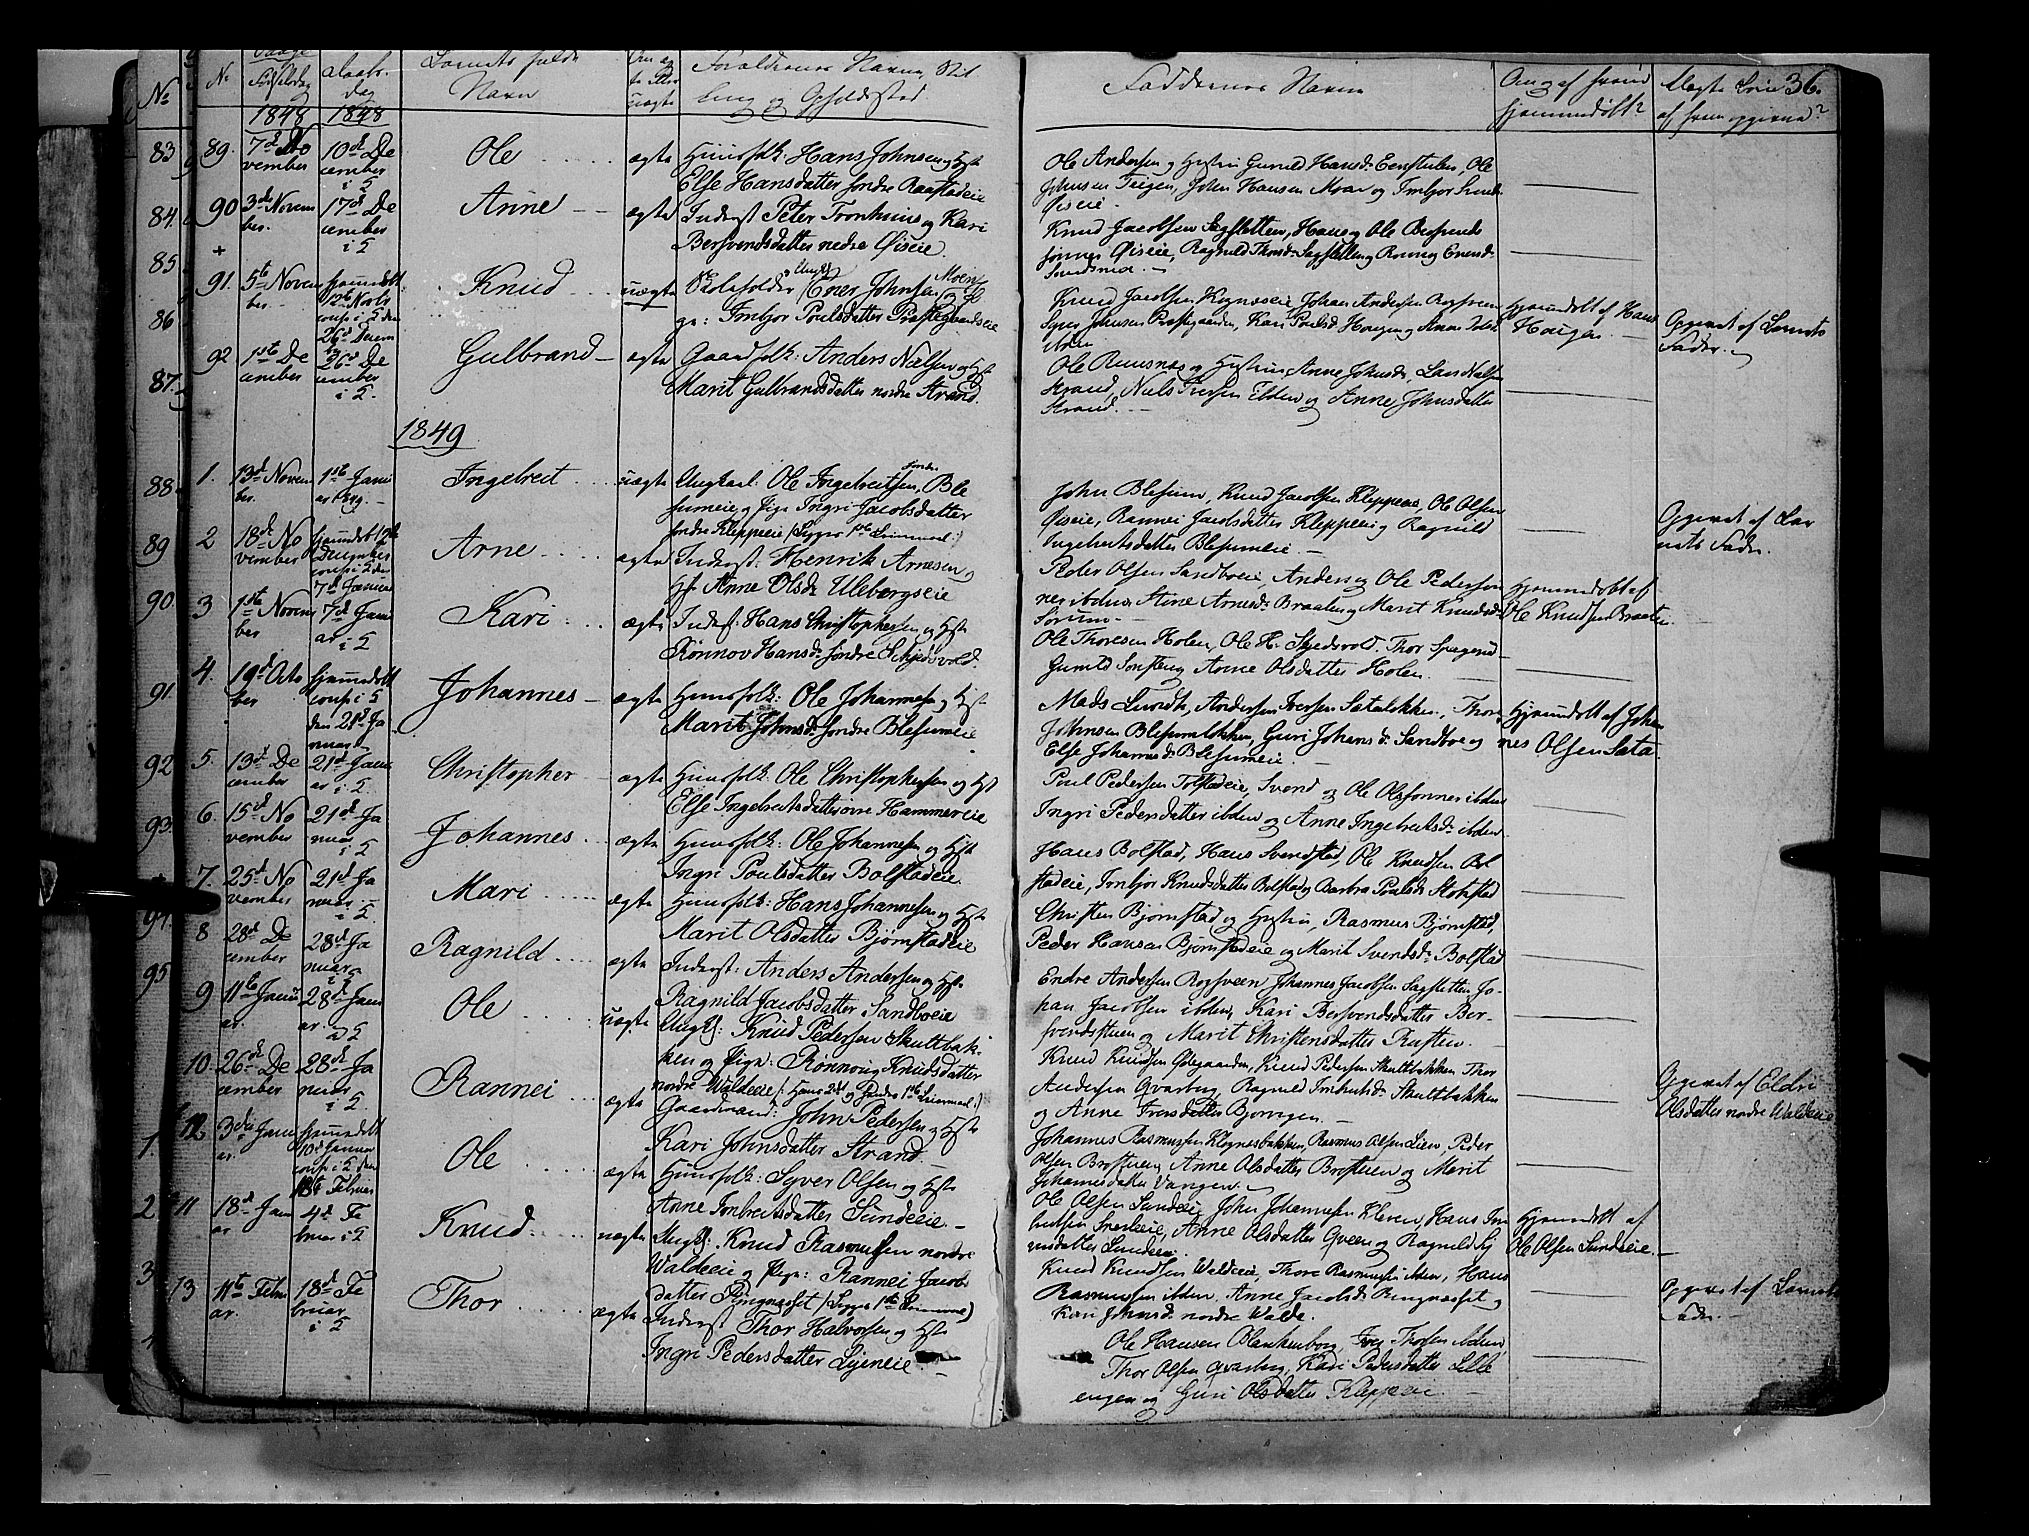 SAH, Vågå prestekontor, Ministerialbok nr. 5 /1, 1842-1856, s. 36